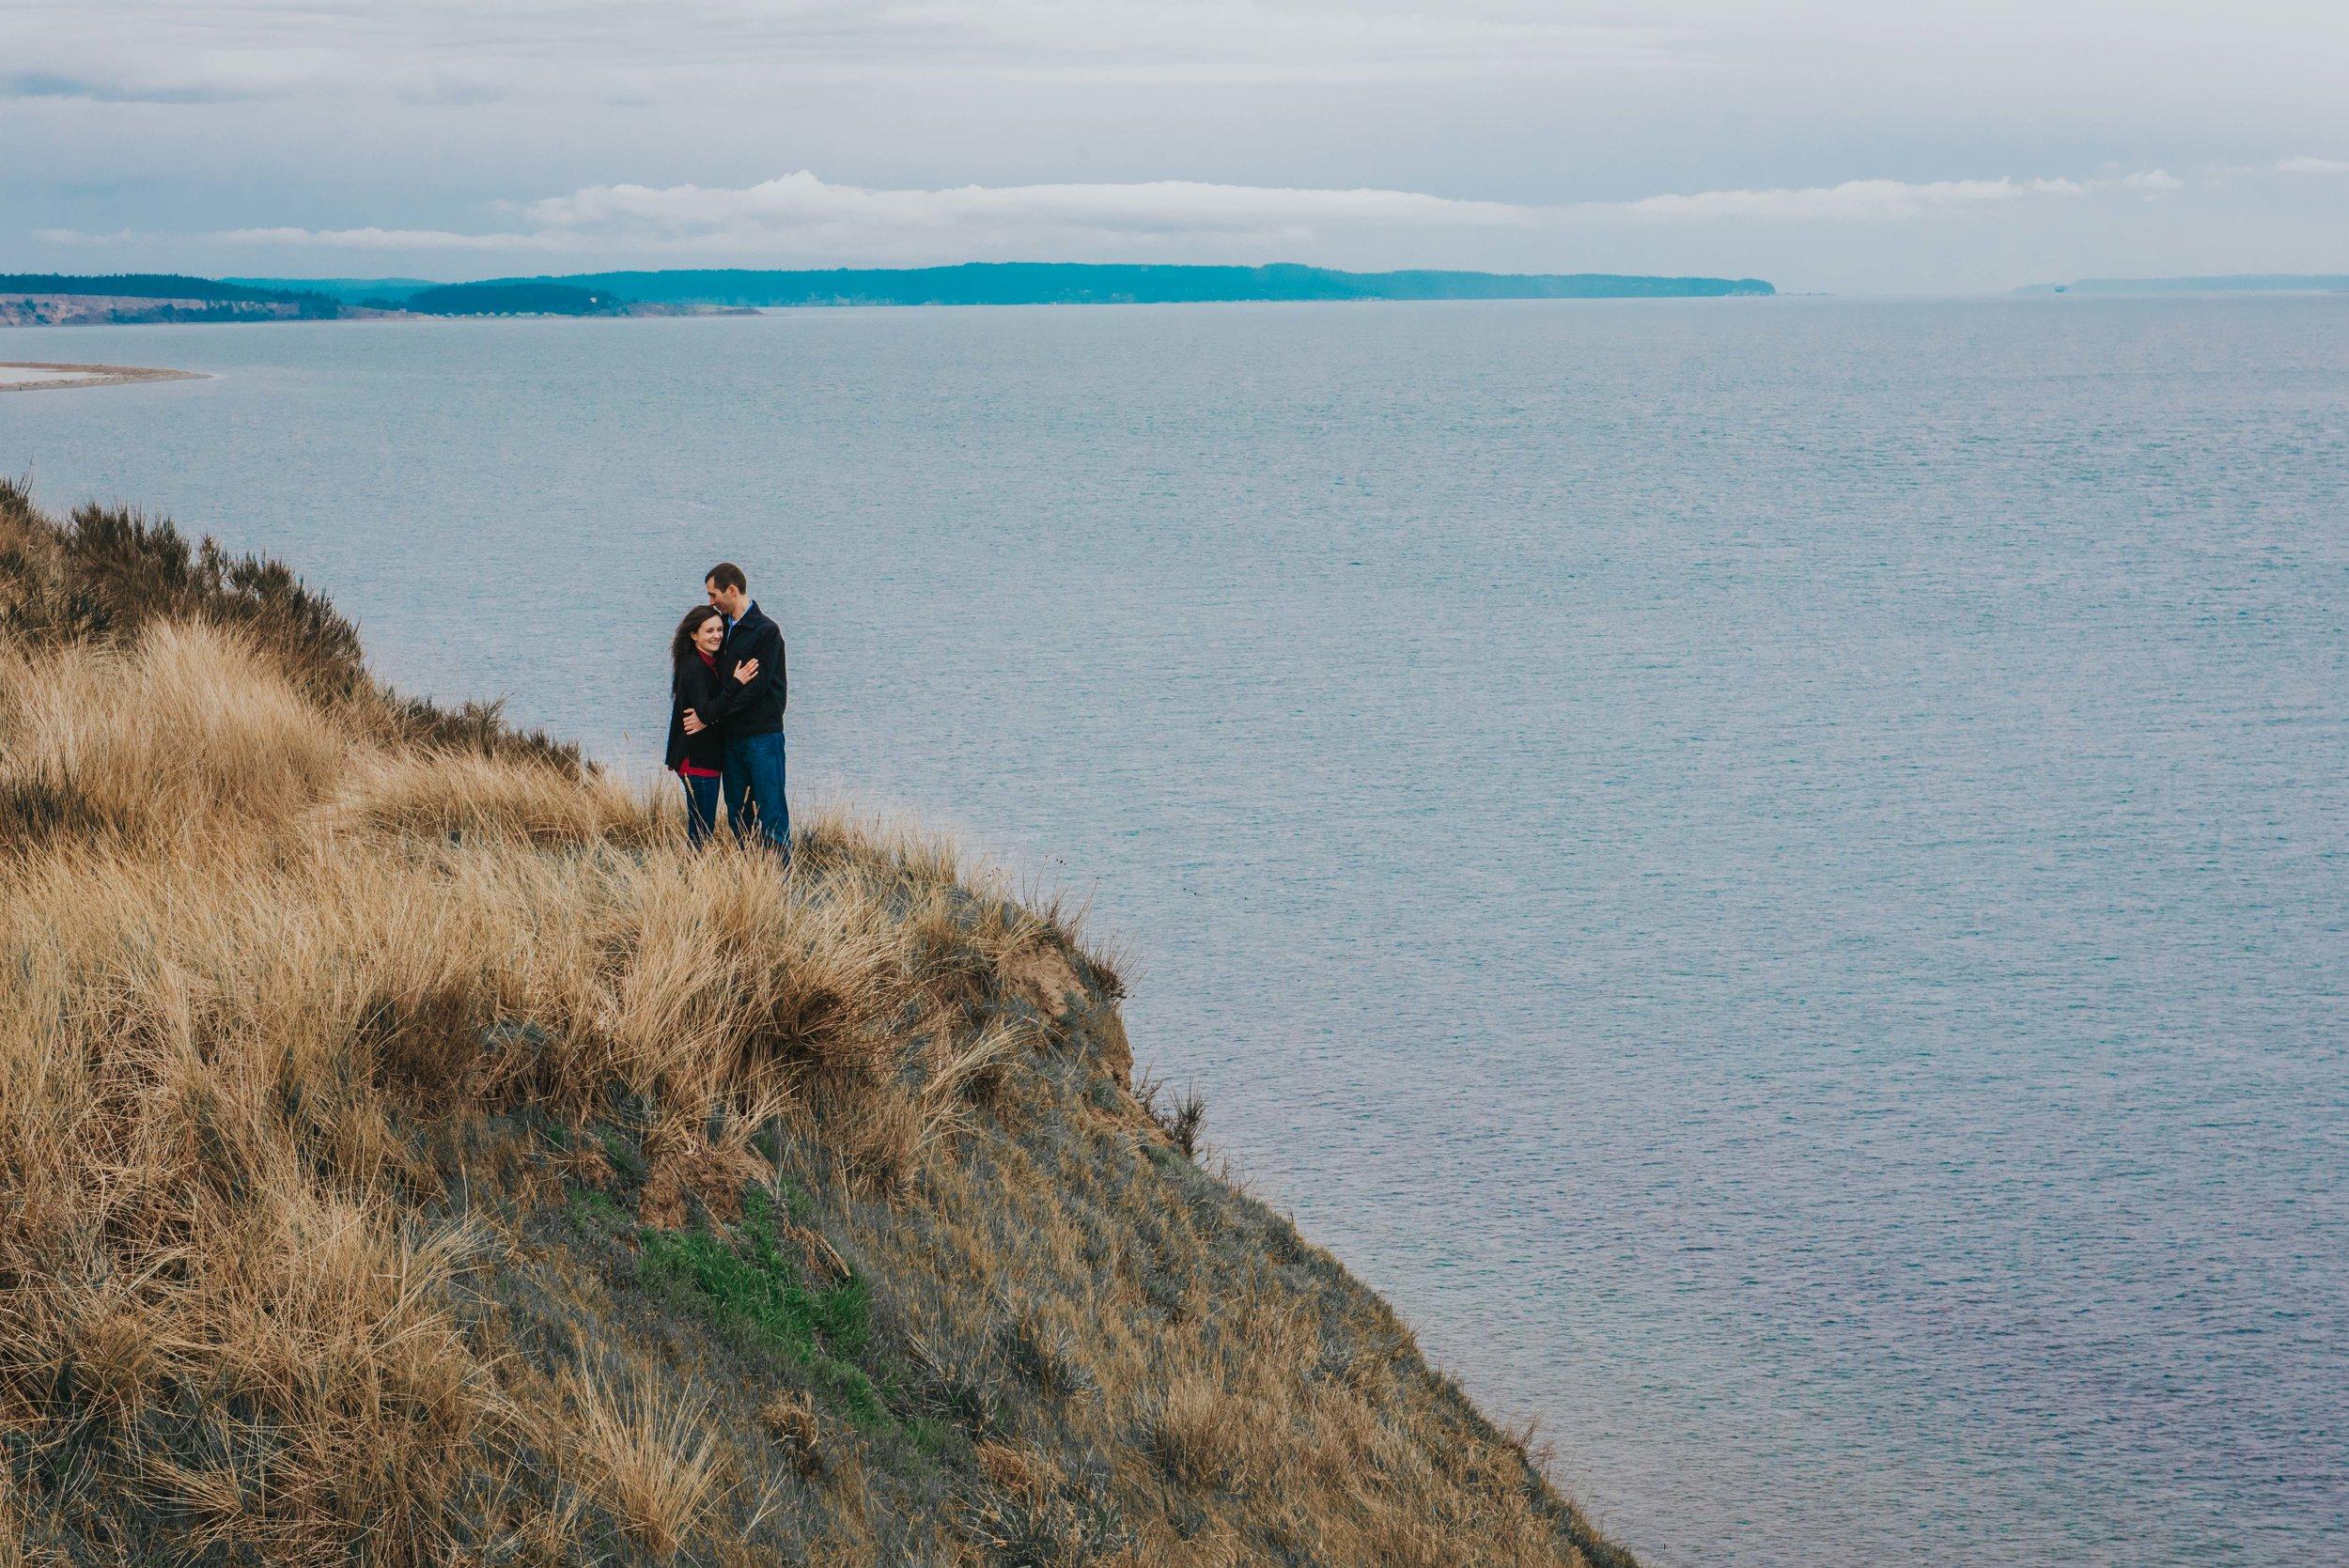 Oak-Harbor-Wedding-Photographer-J-Hodges (22 of 34).jpg